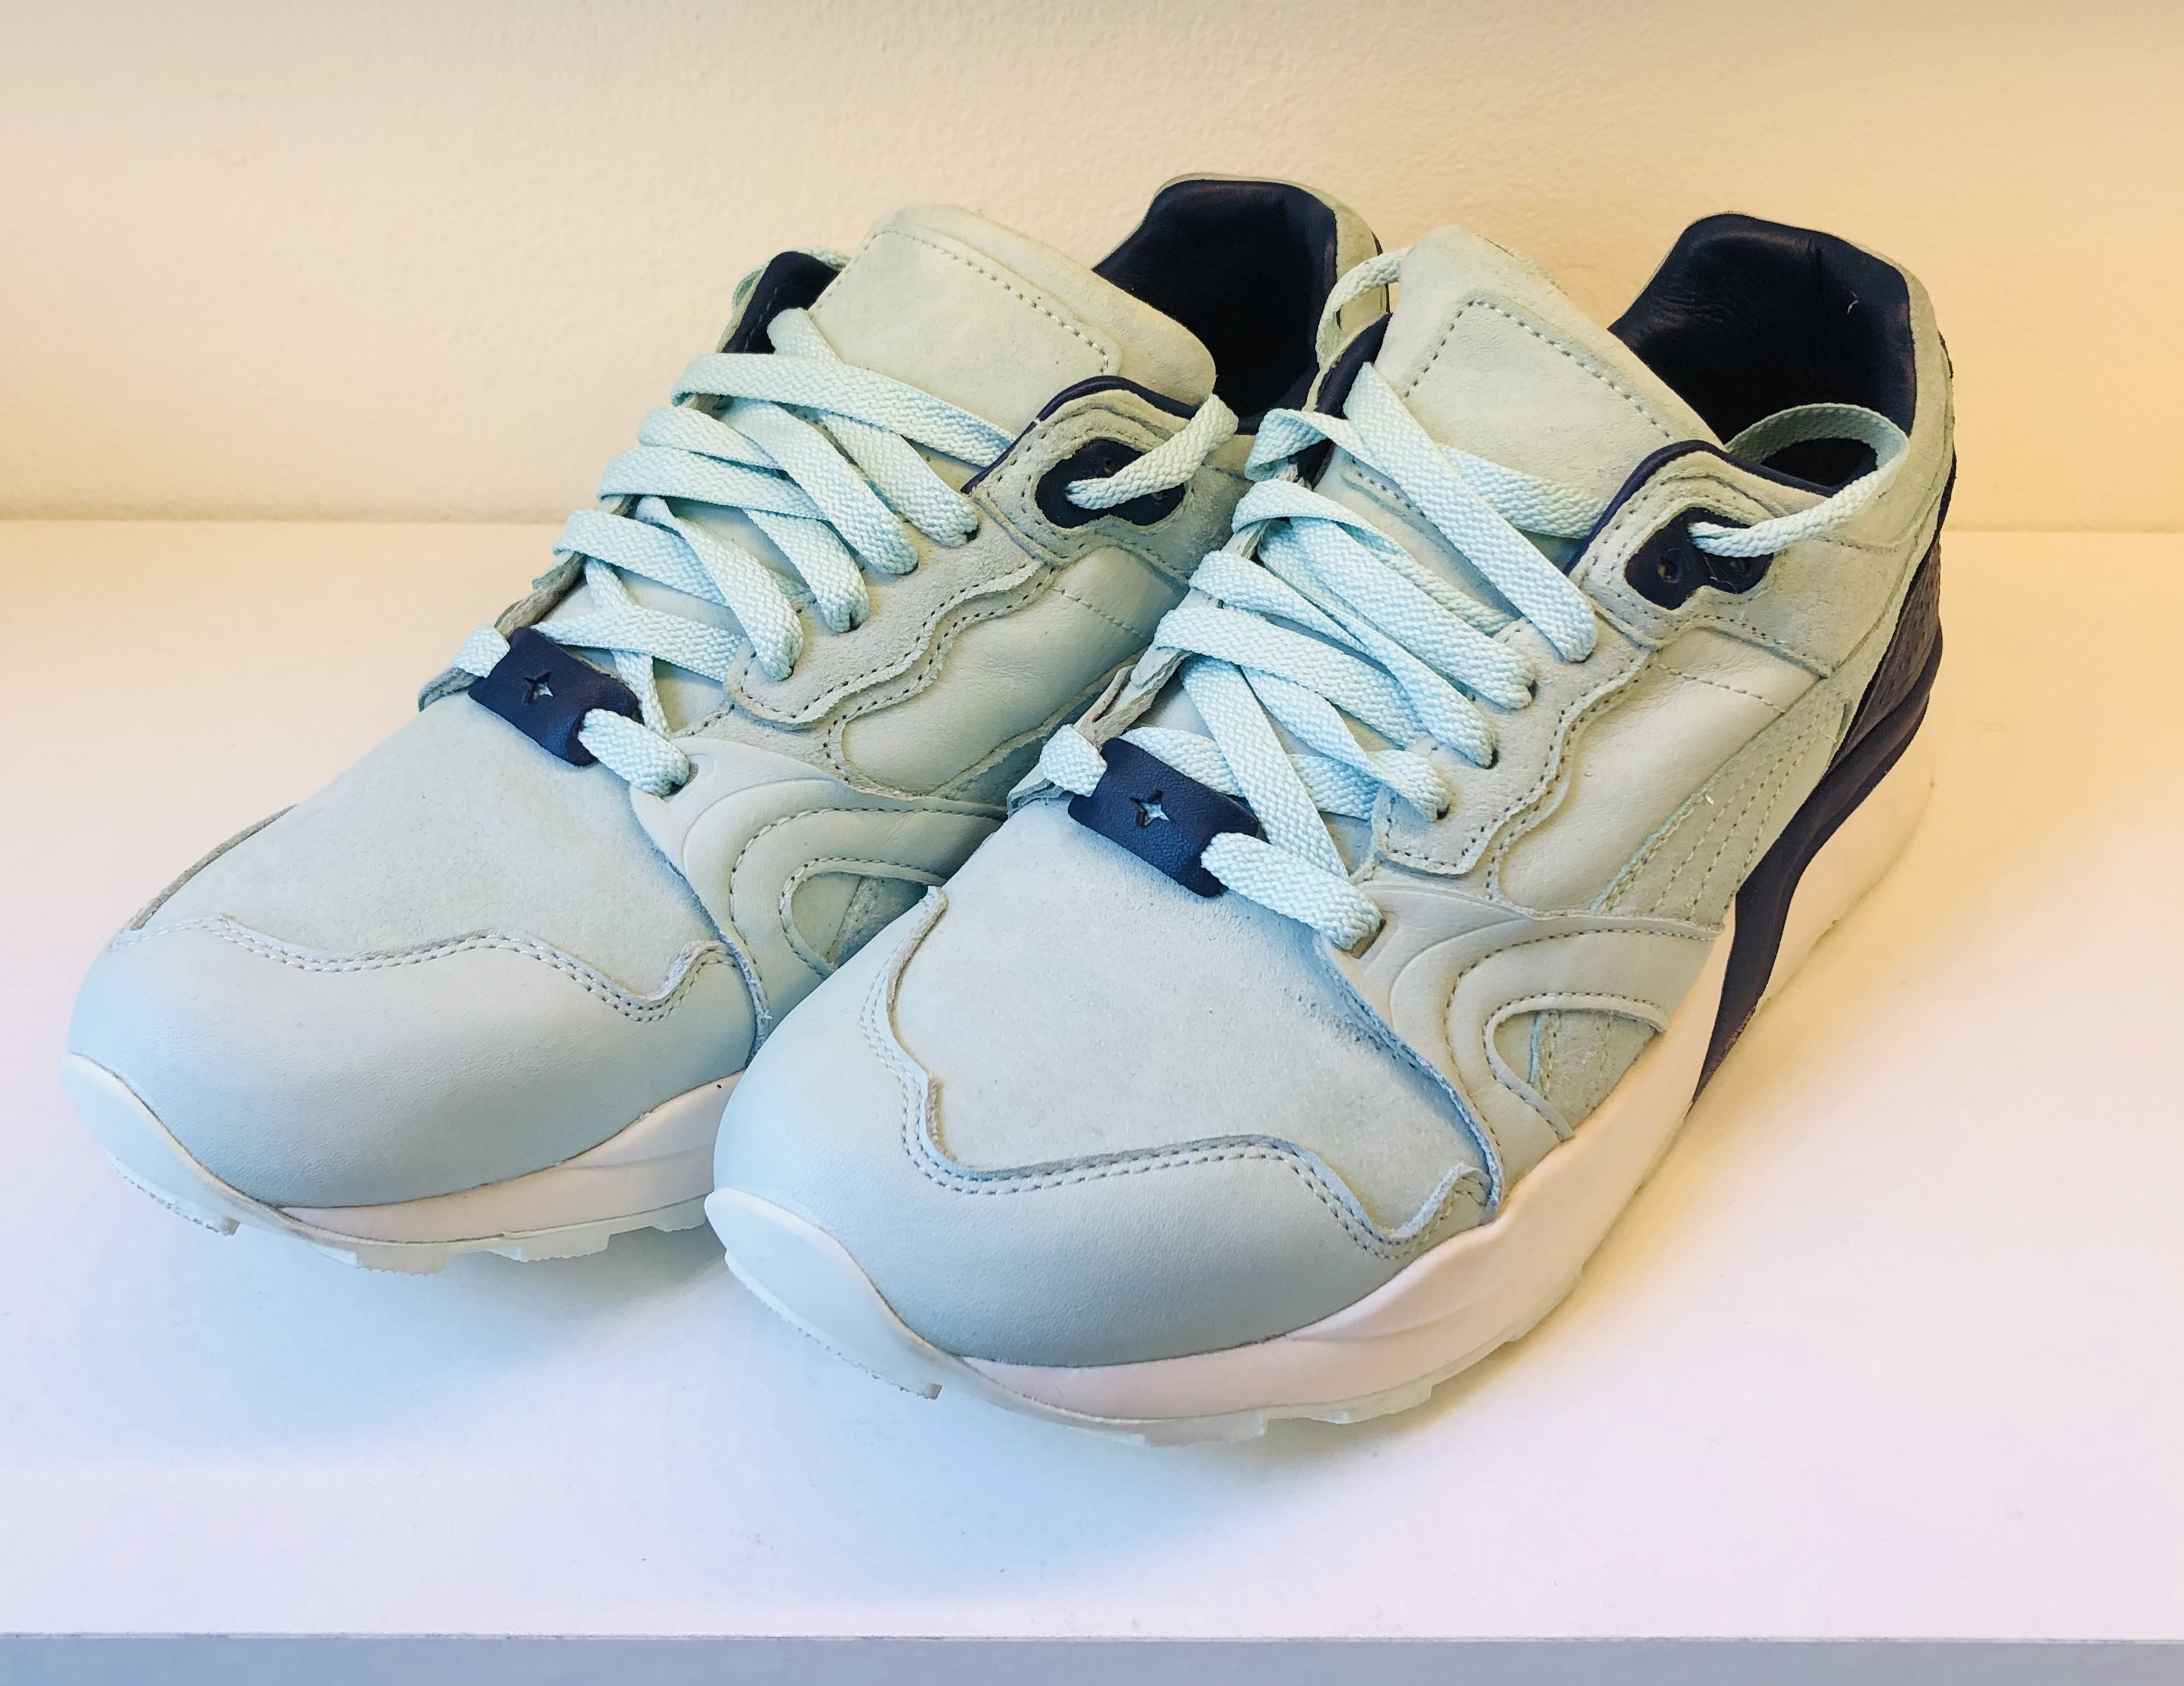 Puma Sneakersnstuff x XT2+ Erik